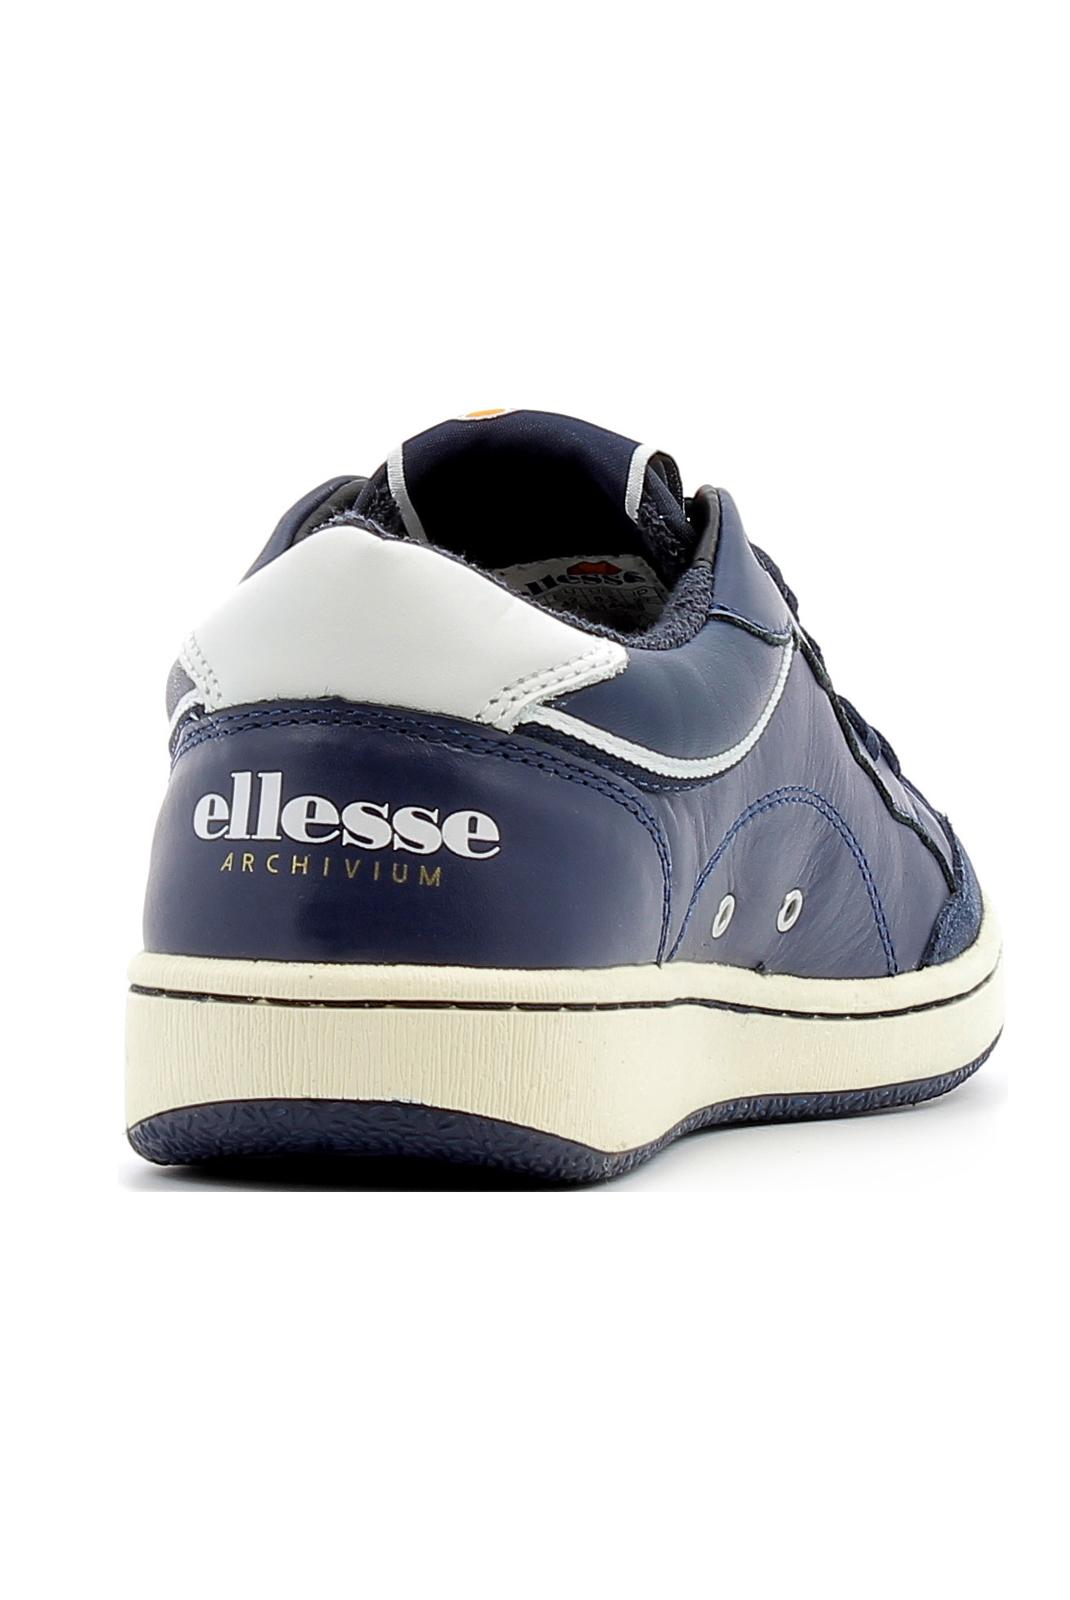 Baskets / Sport  Ellesse EL814468 H 23 DEEP / WHITE